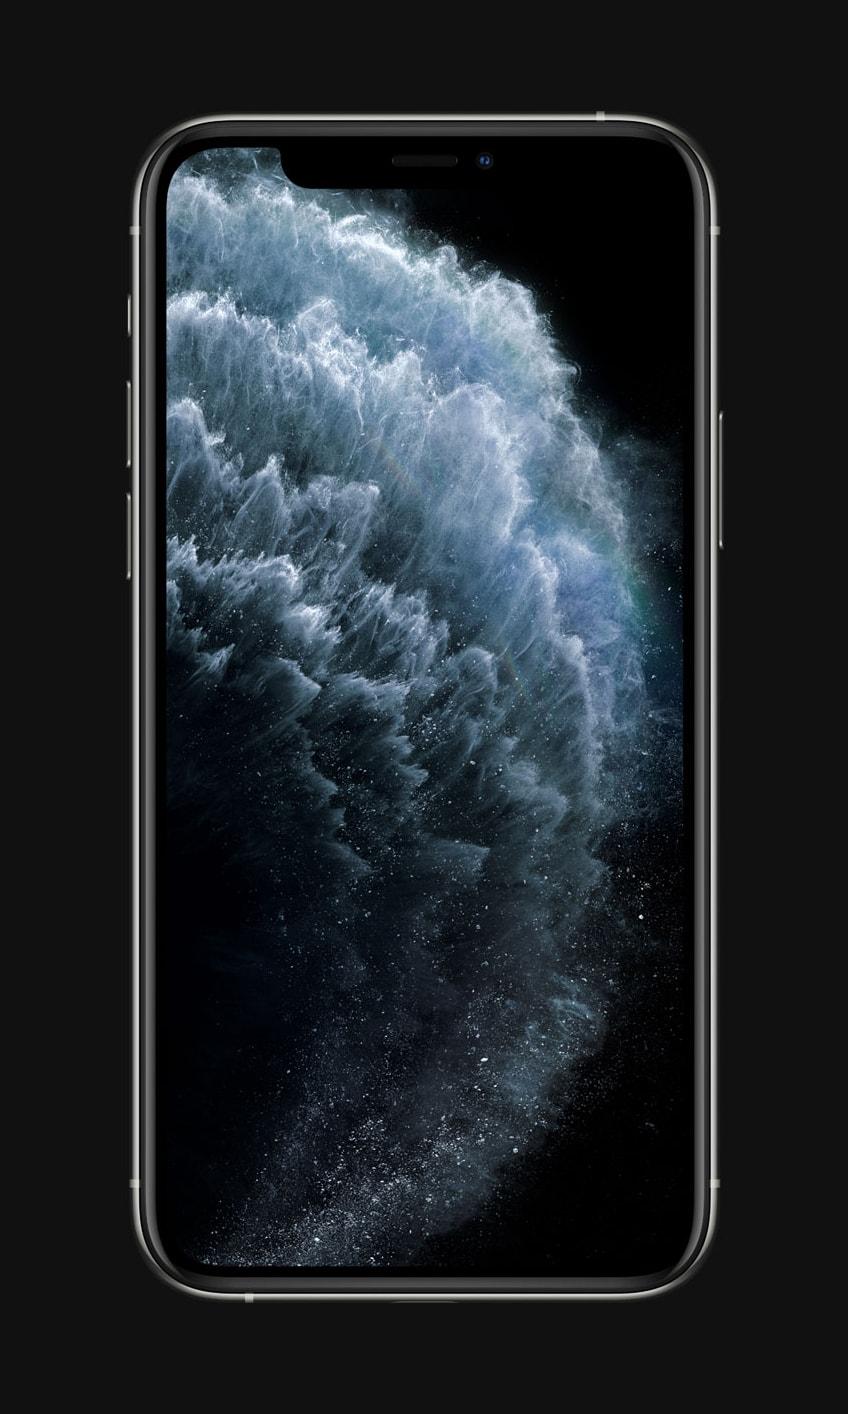 iPhone 11 Pro de frente com wallpaper de água